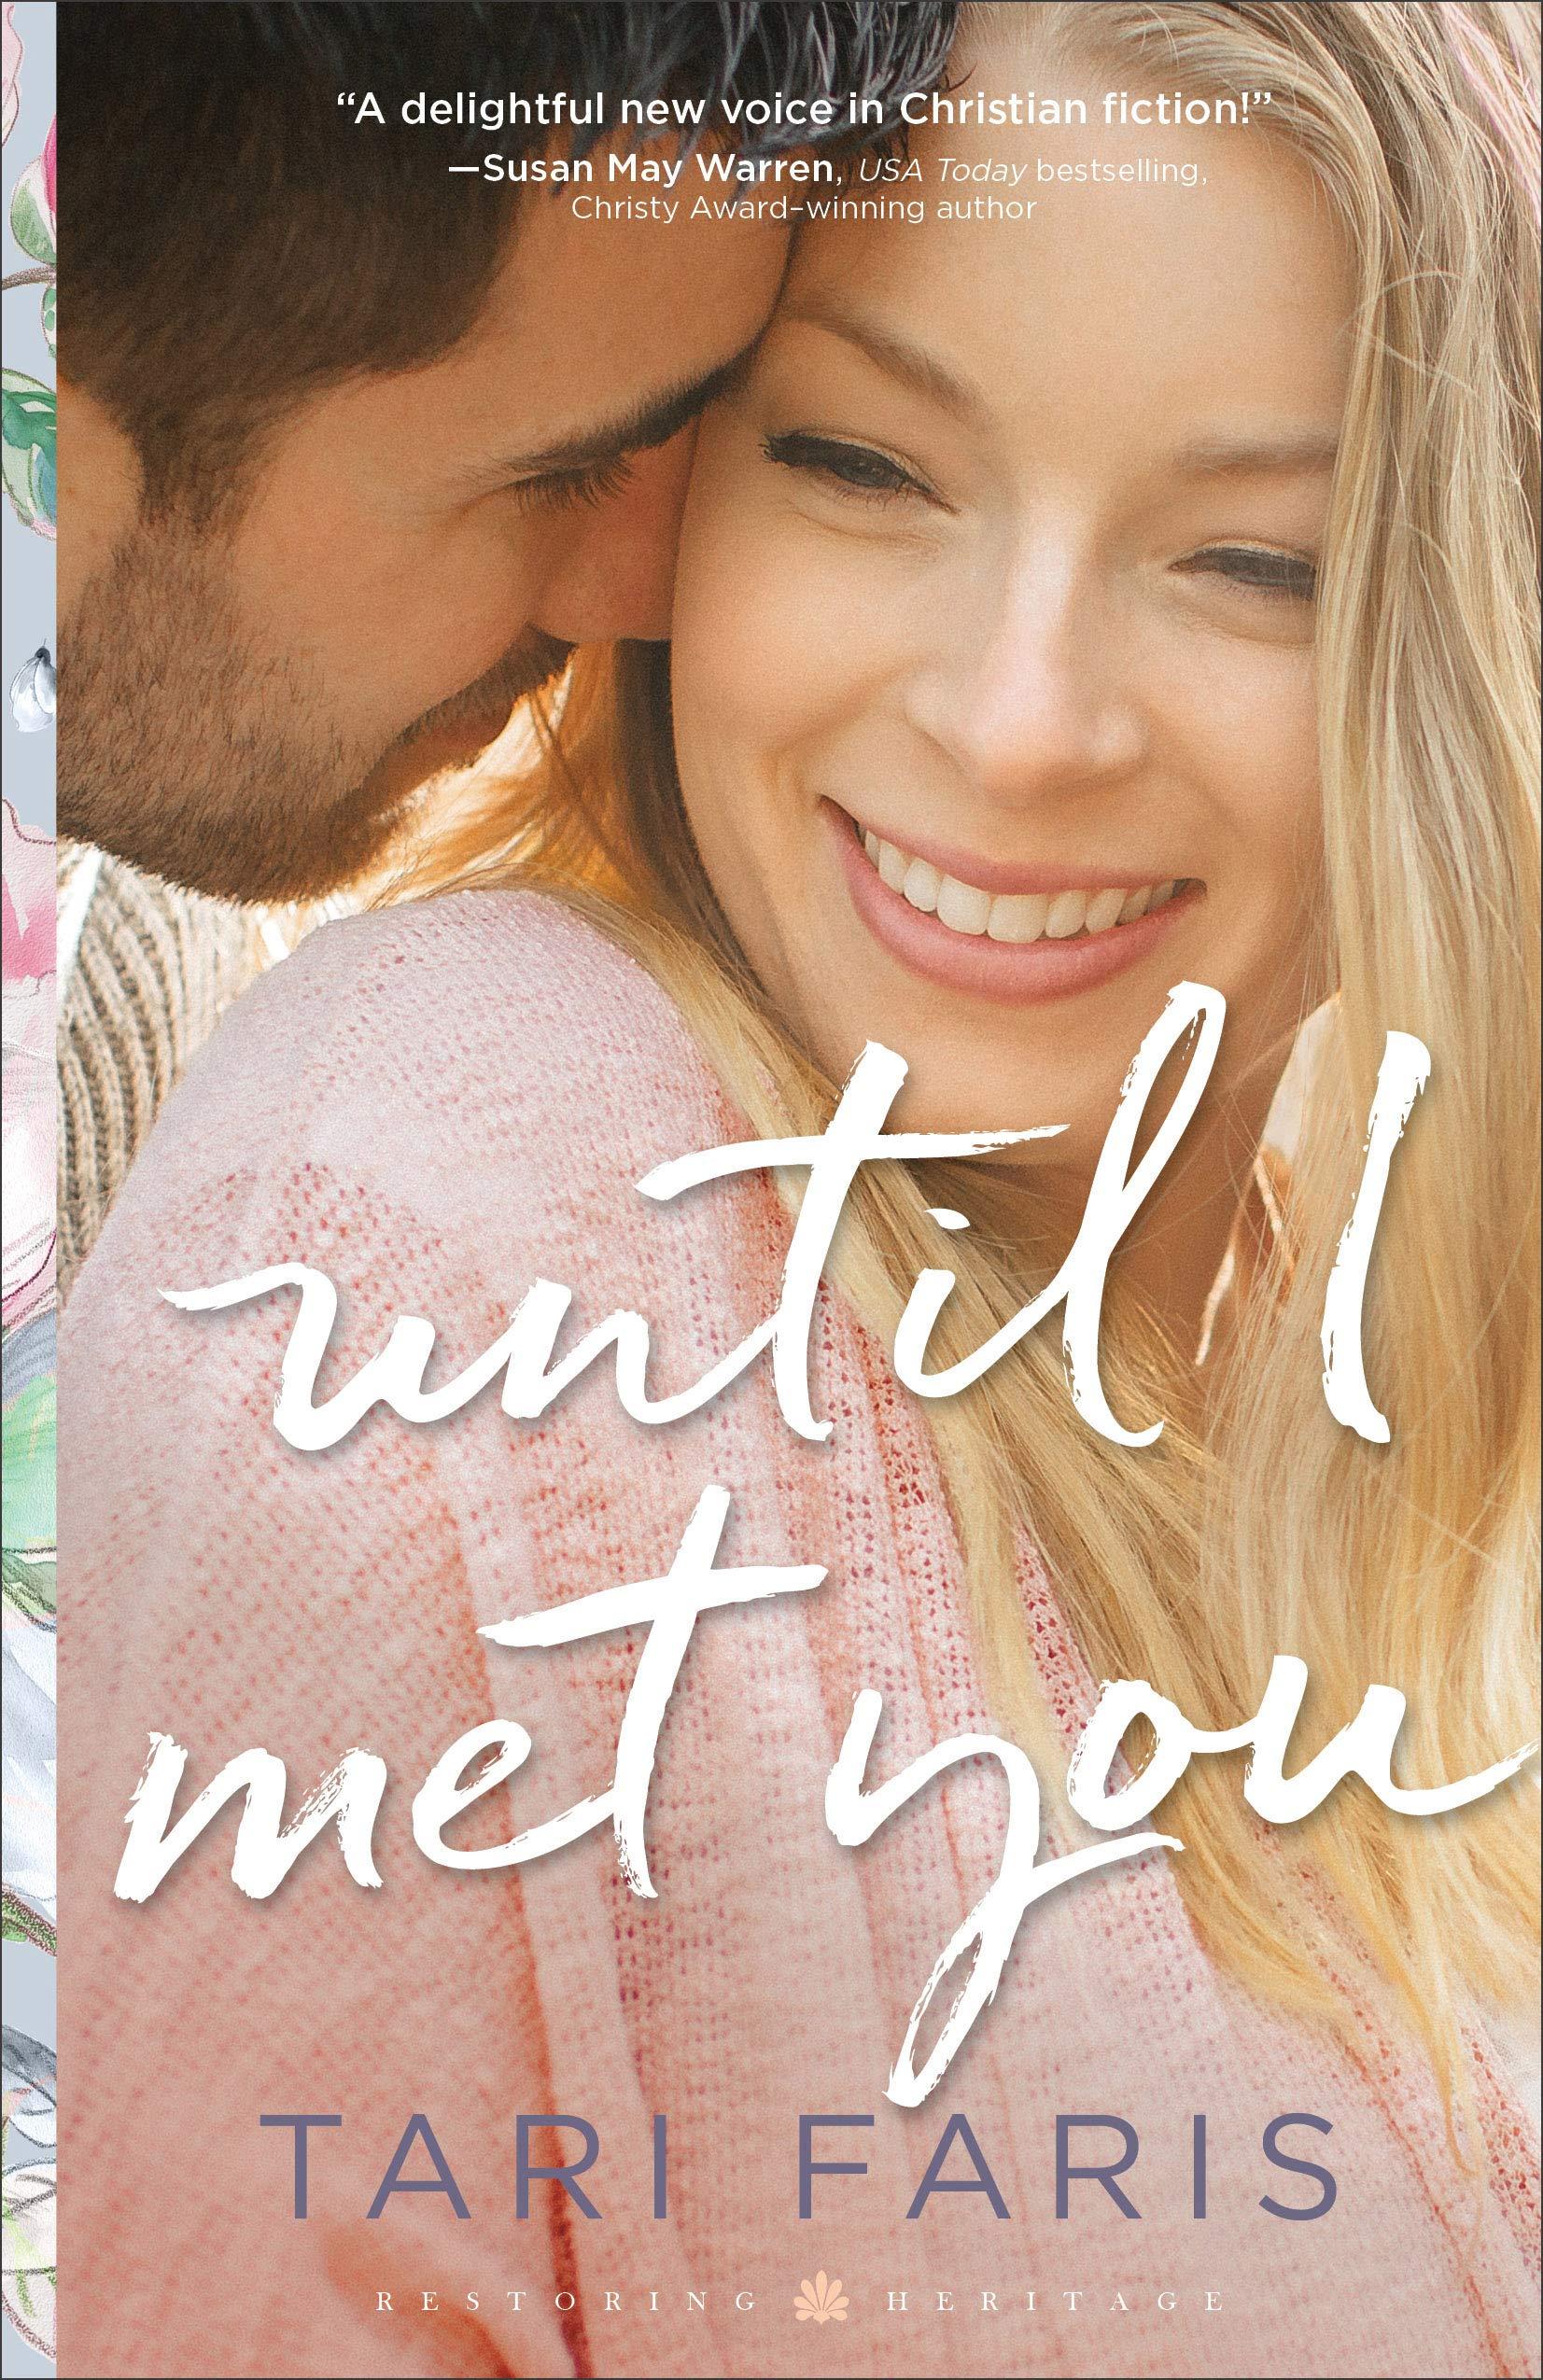 Until I Met You (Restoring Heritage #2) By Tari Faris Release Date? 2020 Romance Releases